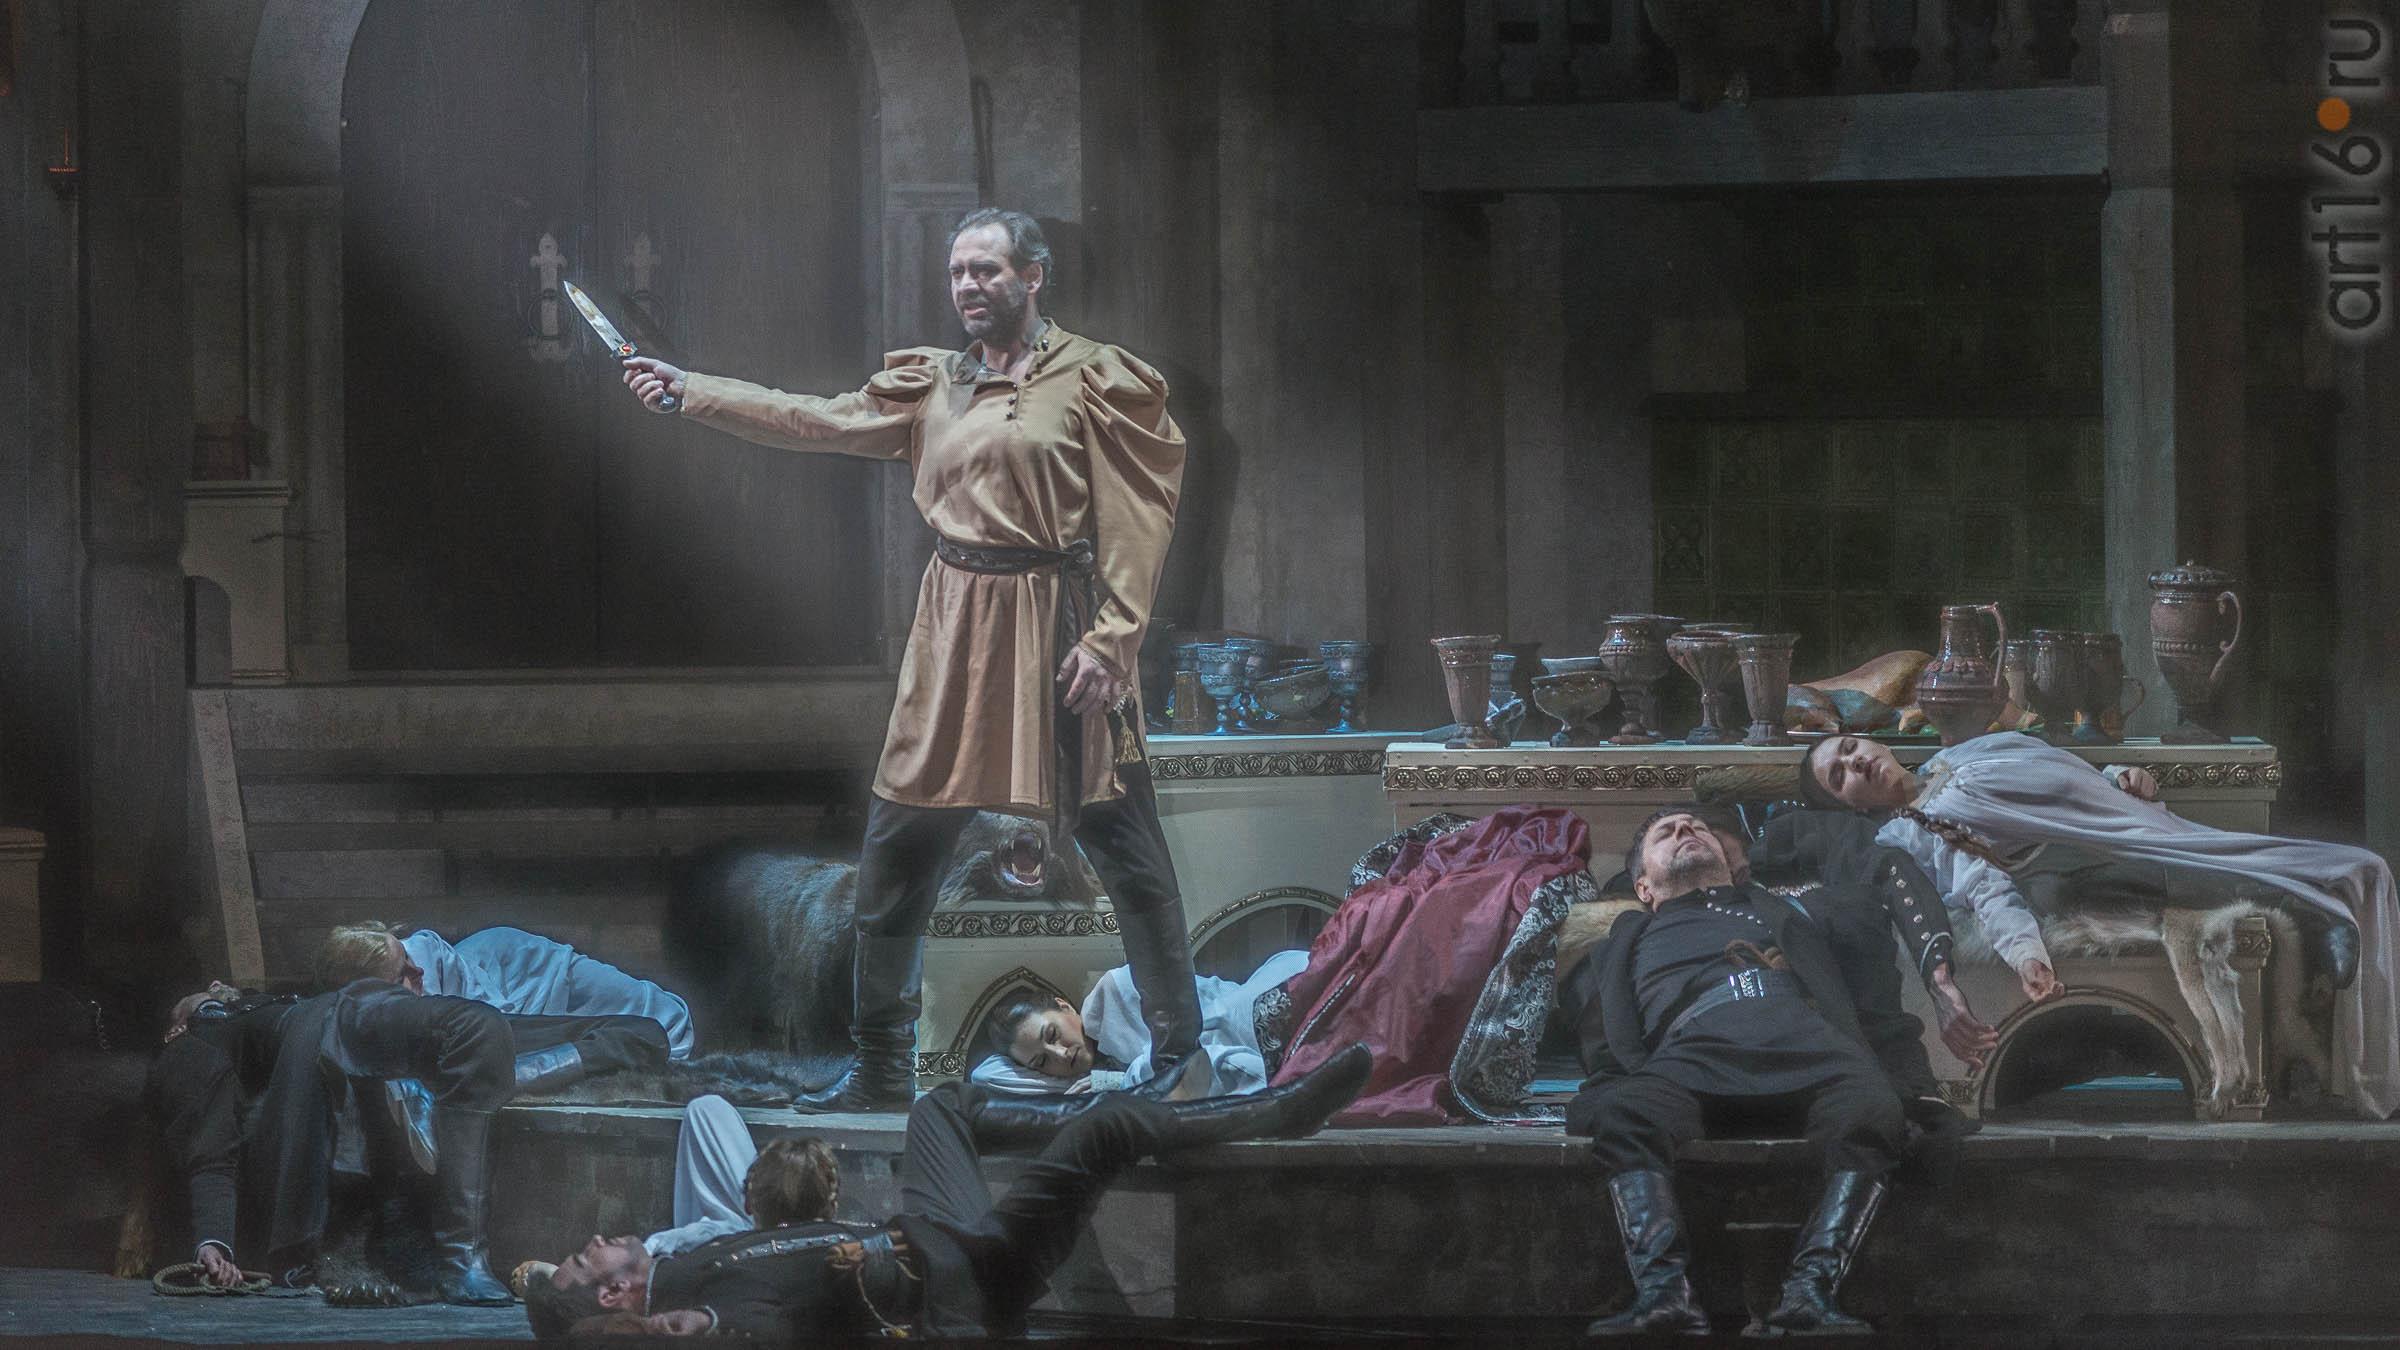 ::Царская невеста. Опера в 3-х действиях. Николай Римский-Корсаков